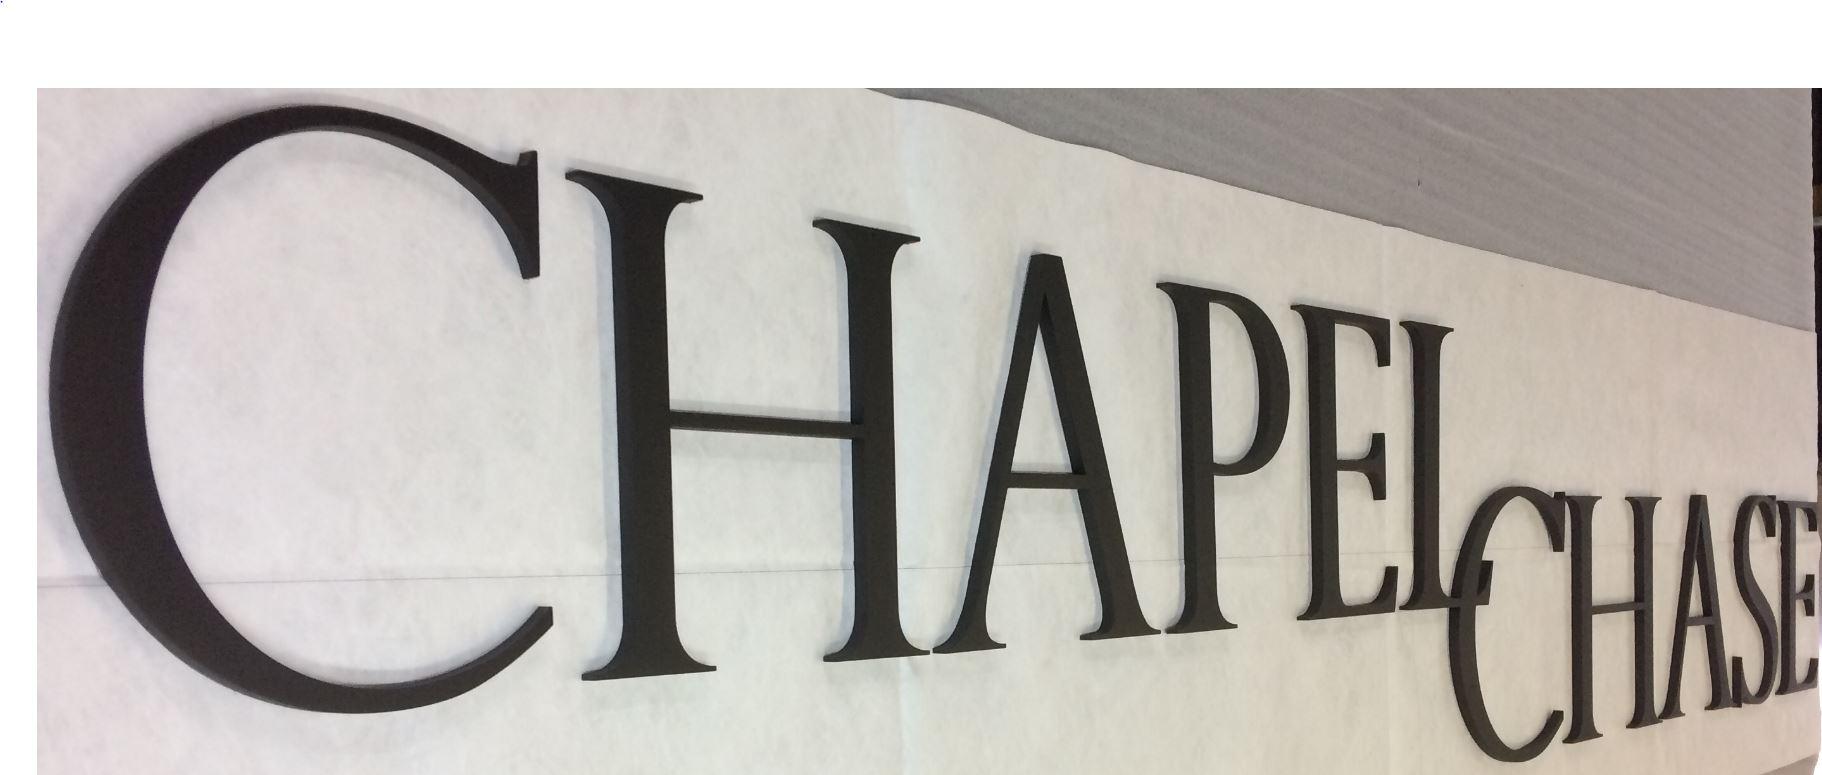 11 - Textured Powder Coat - Chapel Chase (snip).JPG